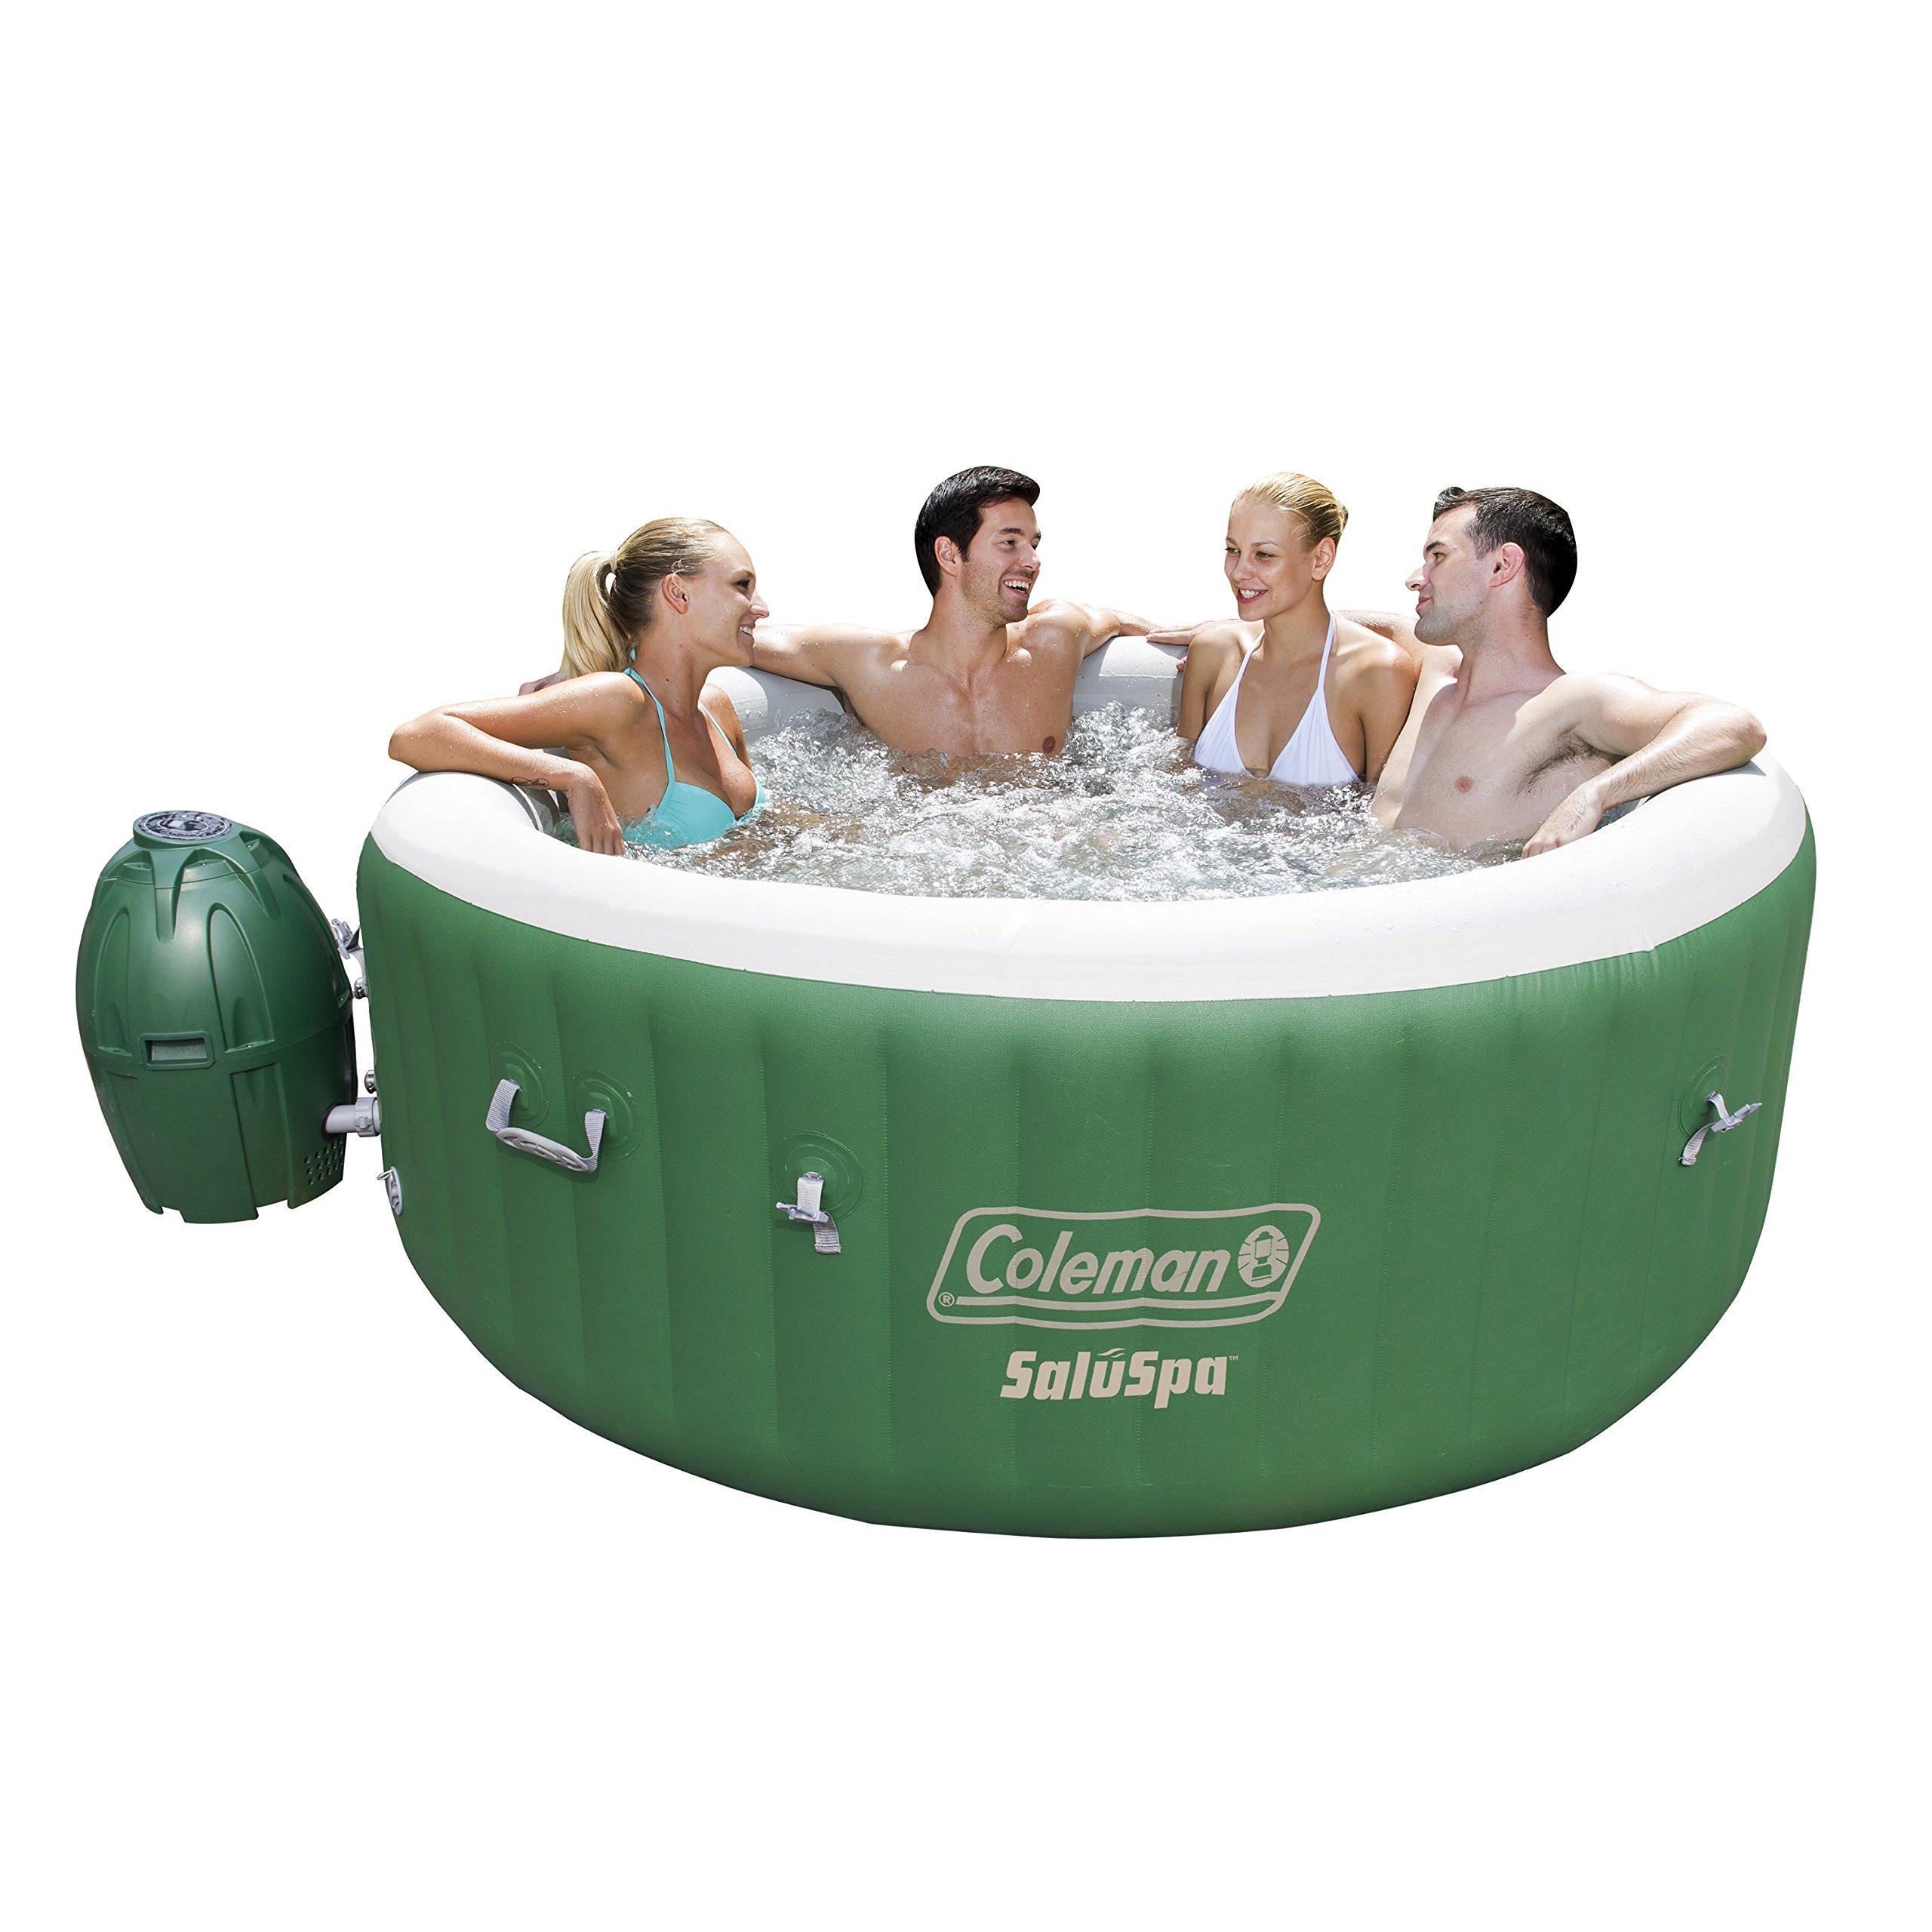 living of hammock luxury best tub inspiration tubs in design beautiful graphics hot panama amazon